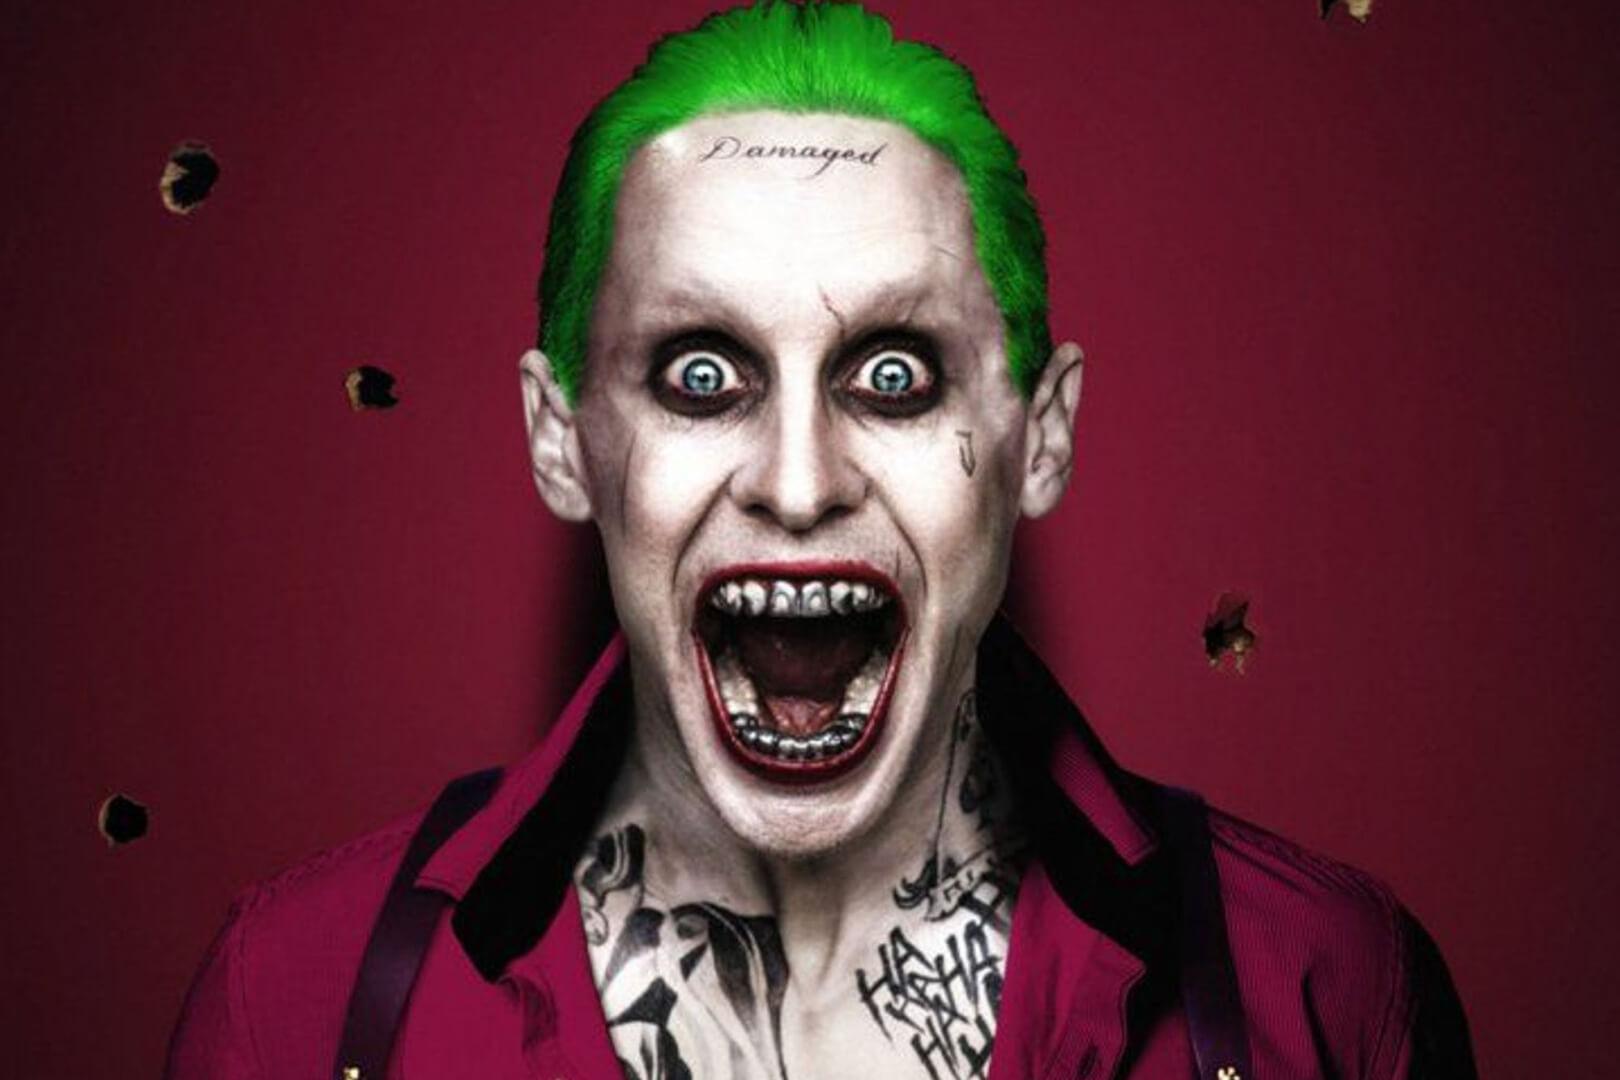 Suicide Squad director reveals origins of Jokers damaged